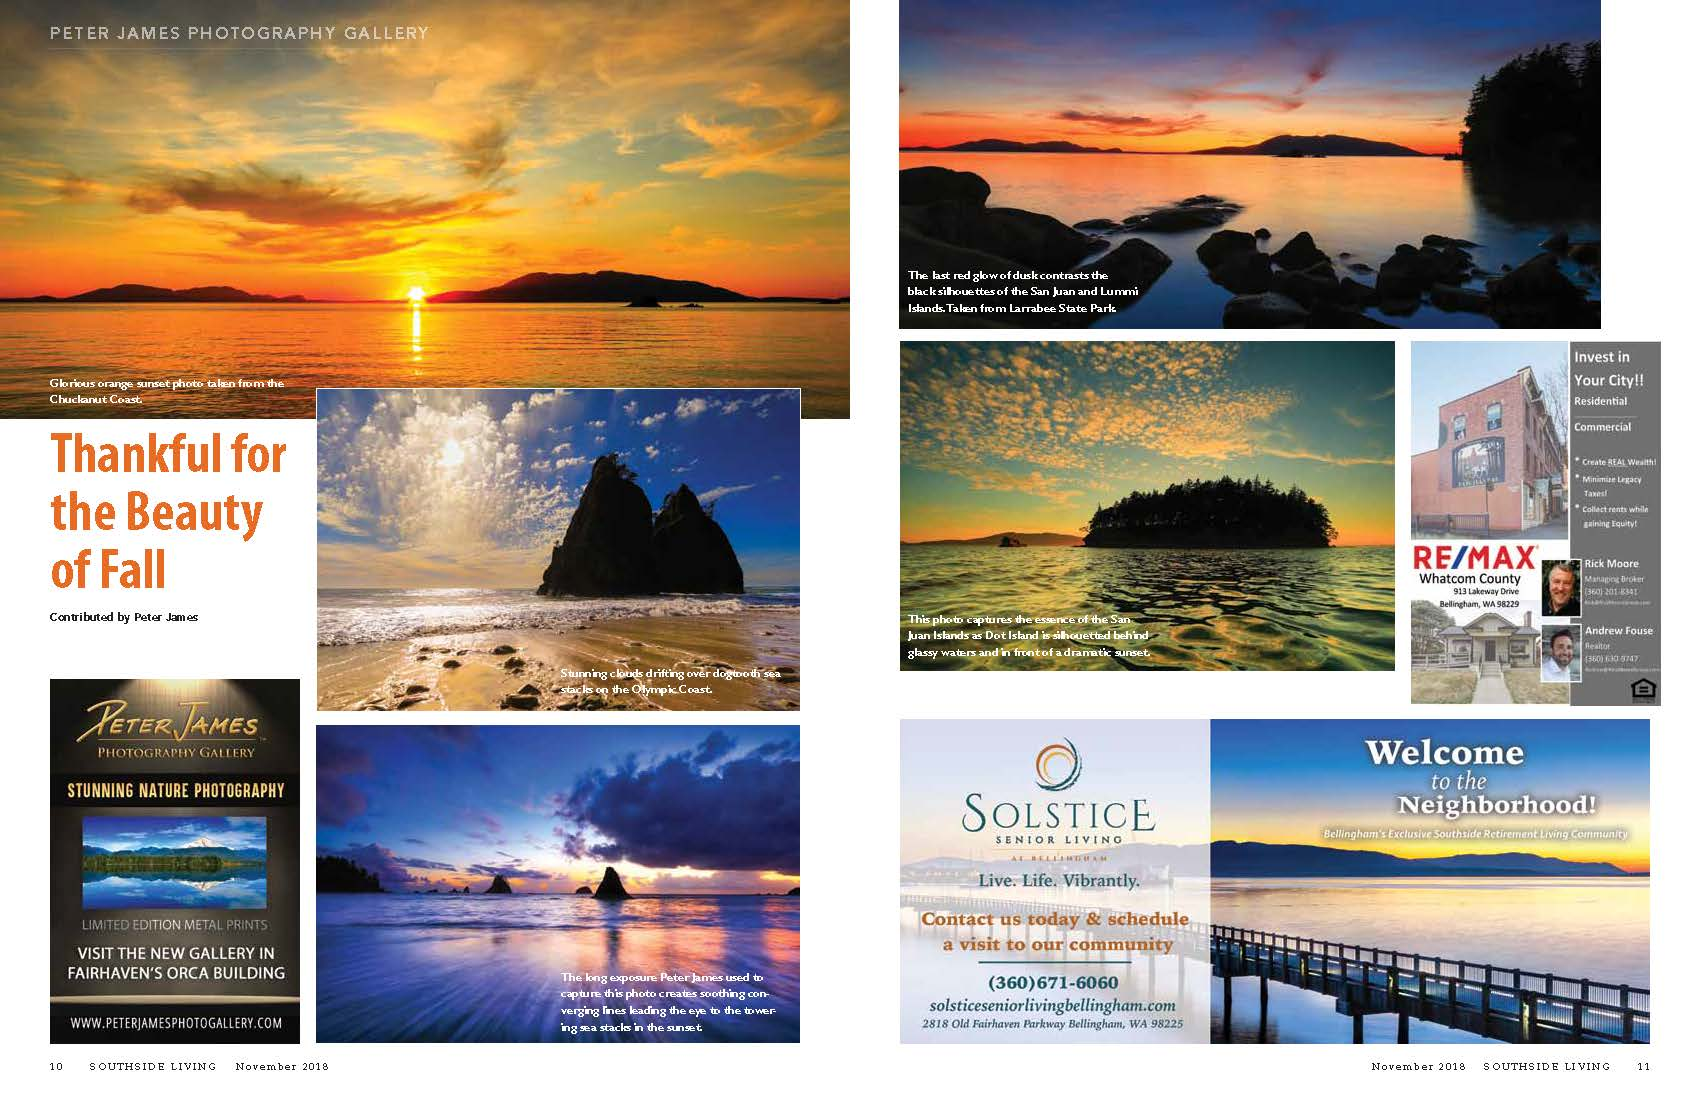 Landscape photos of Chuckanut